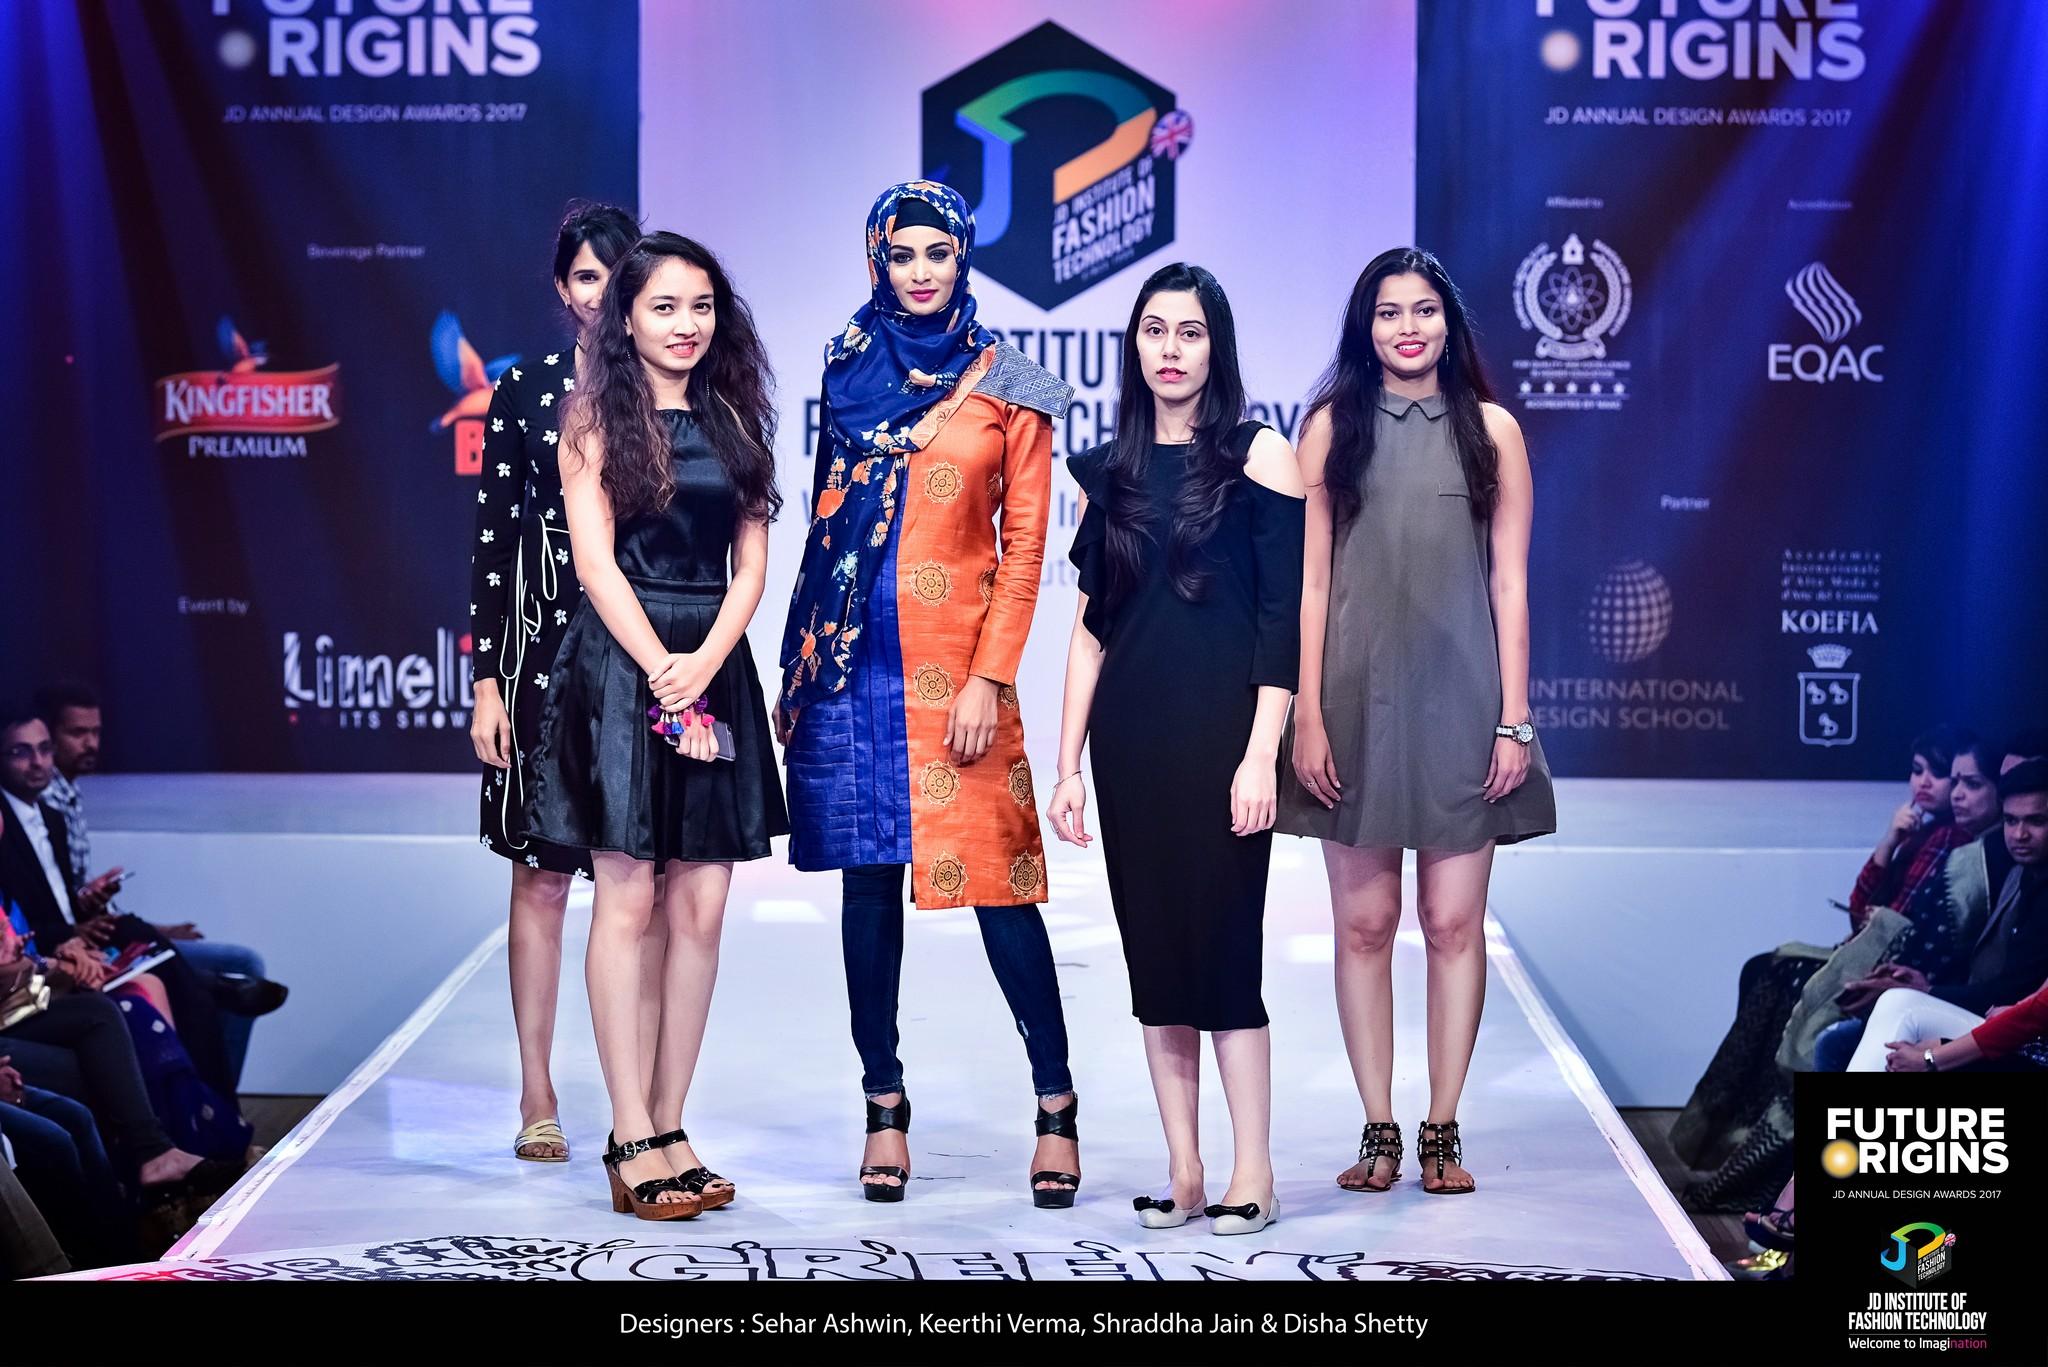 Inaayat - Future Origin - JD Annual Design Awards 2017 | Photography : Jerin Nath (@jerin_nath) inaayat Inaayat – Future Origin – JD Annual Design Awards 2017 Inaayat     Future Origin     JD Annual Design Awards 2017 7